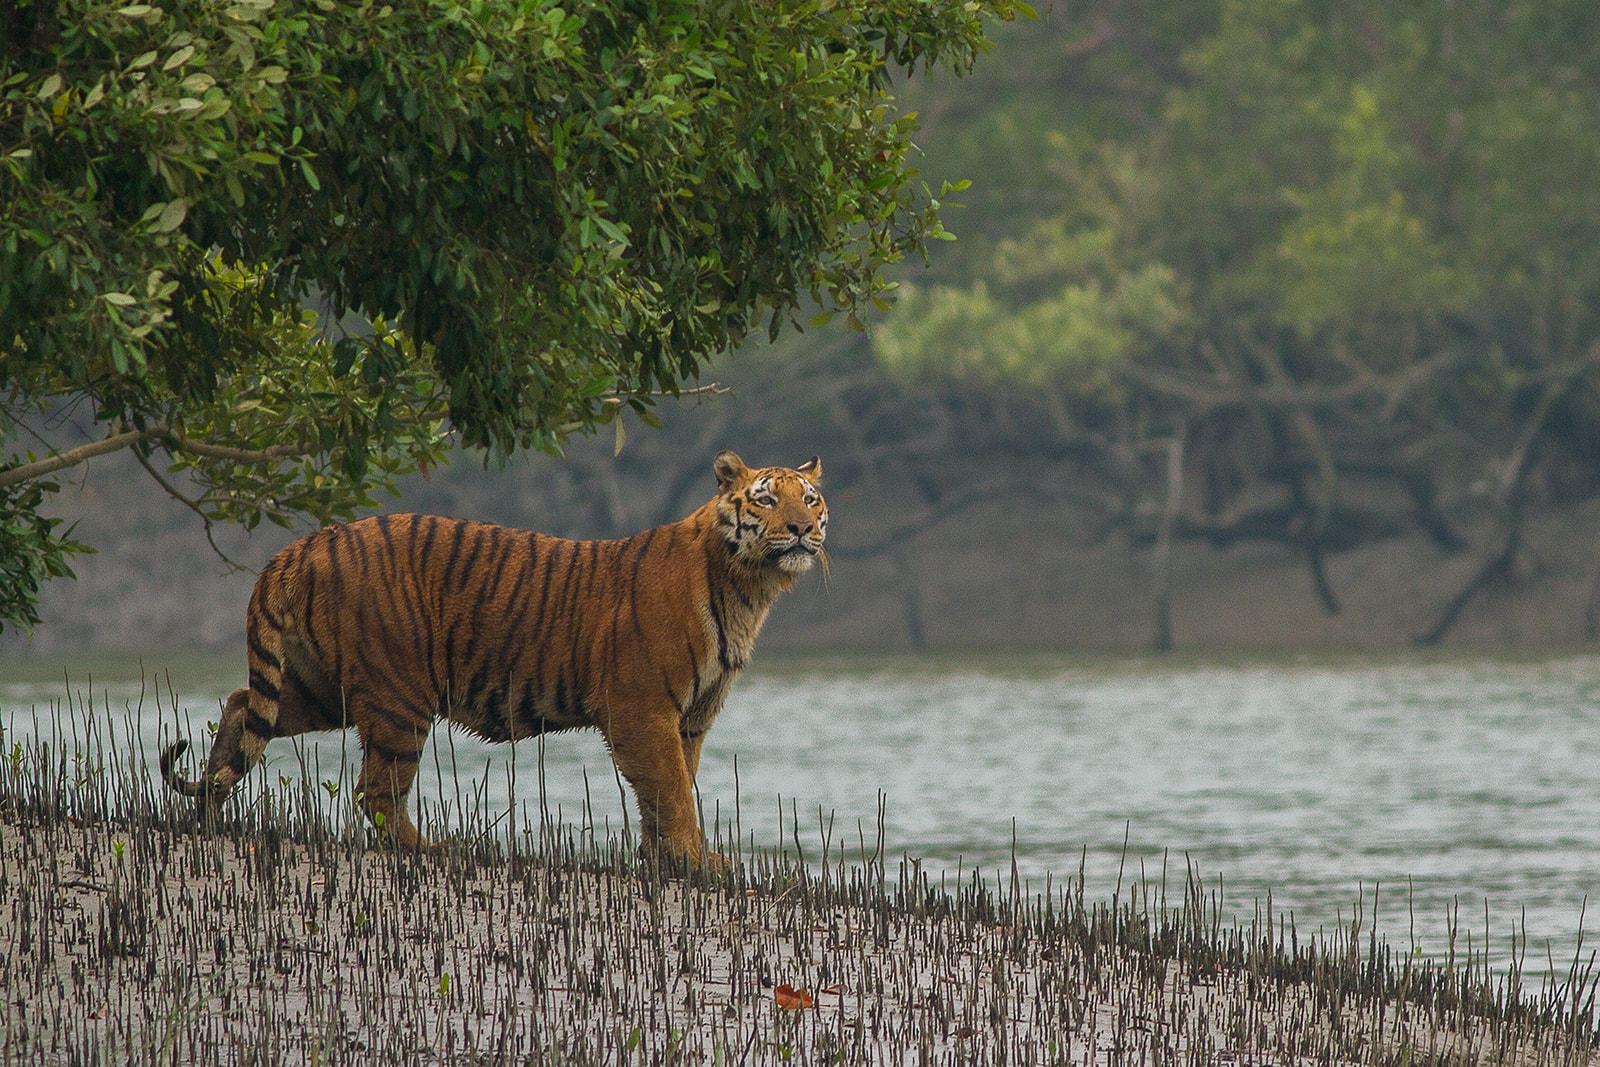 Animaux en Inde, où observer les animaux sauvages ?